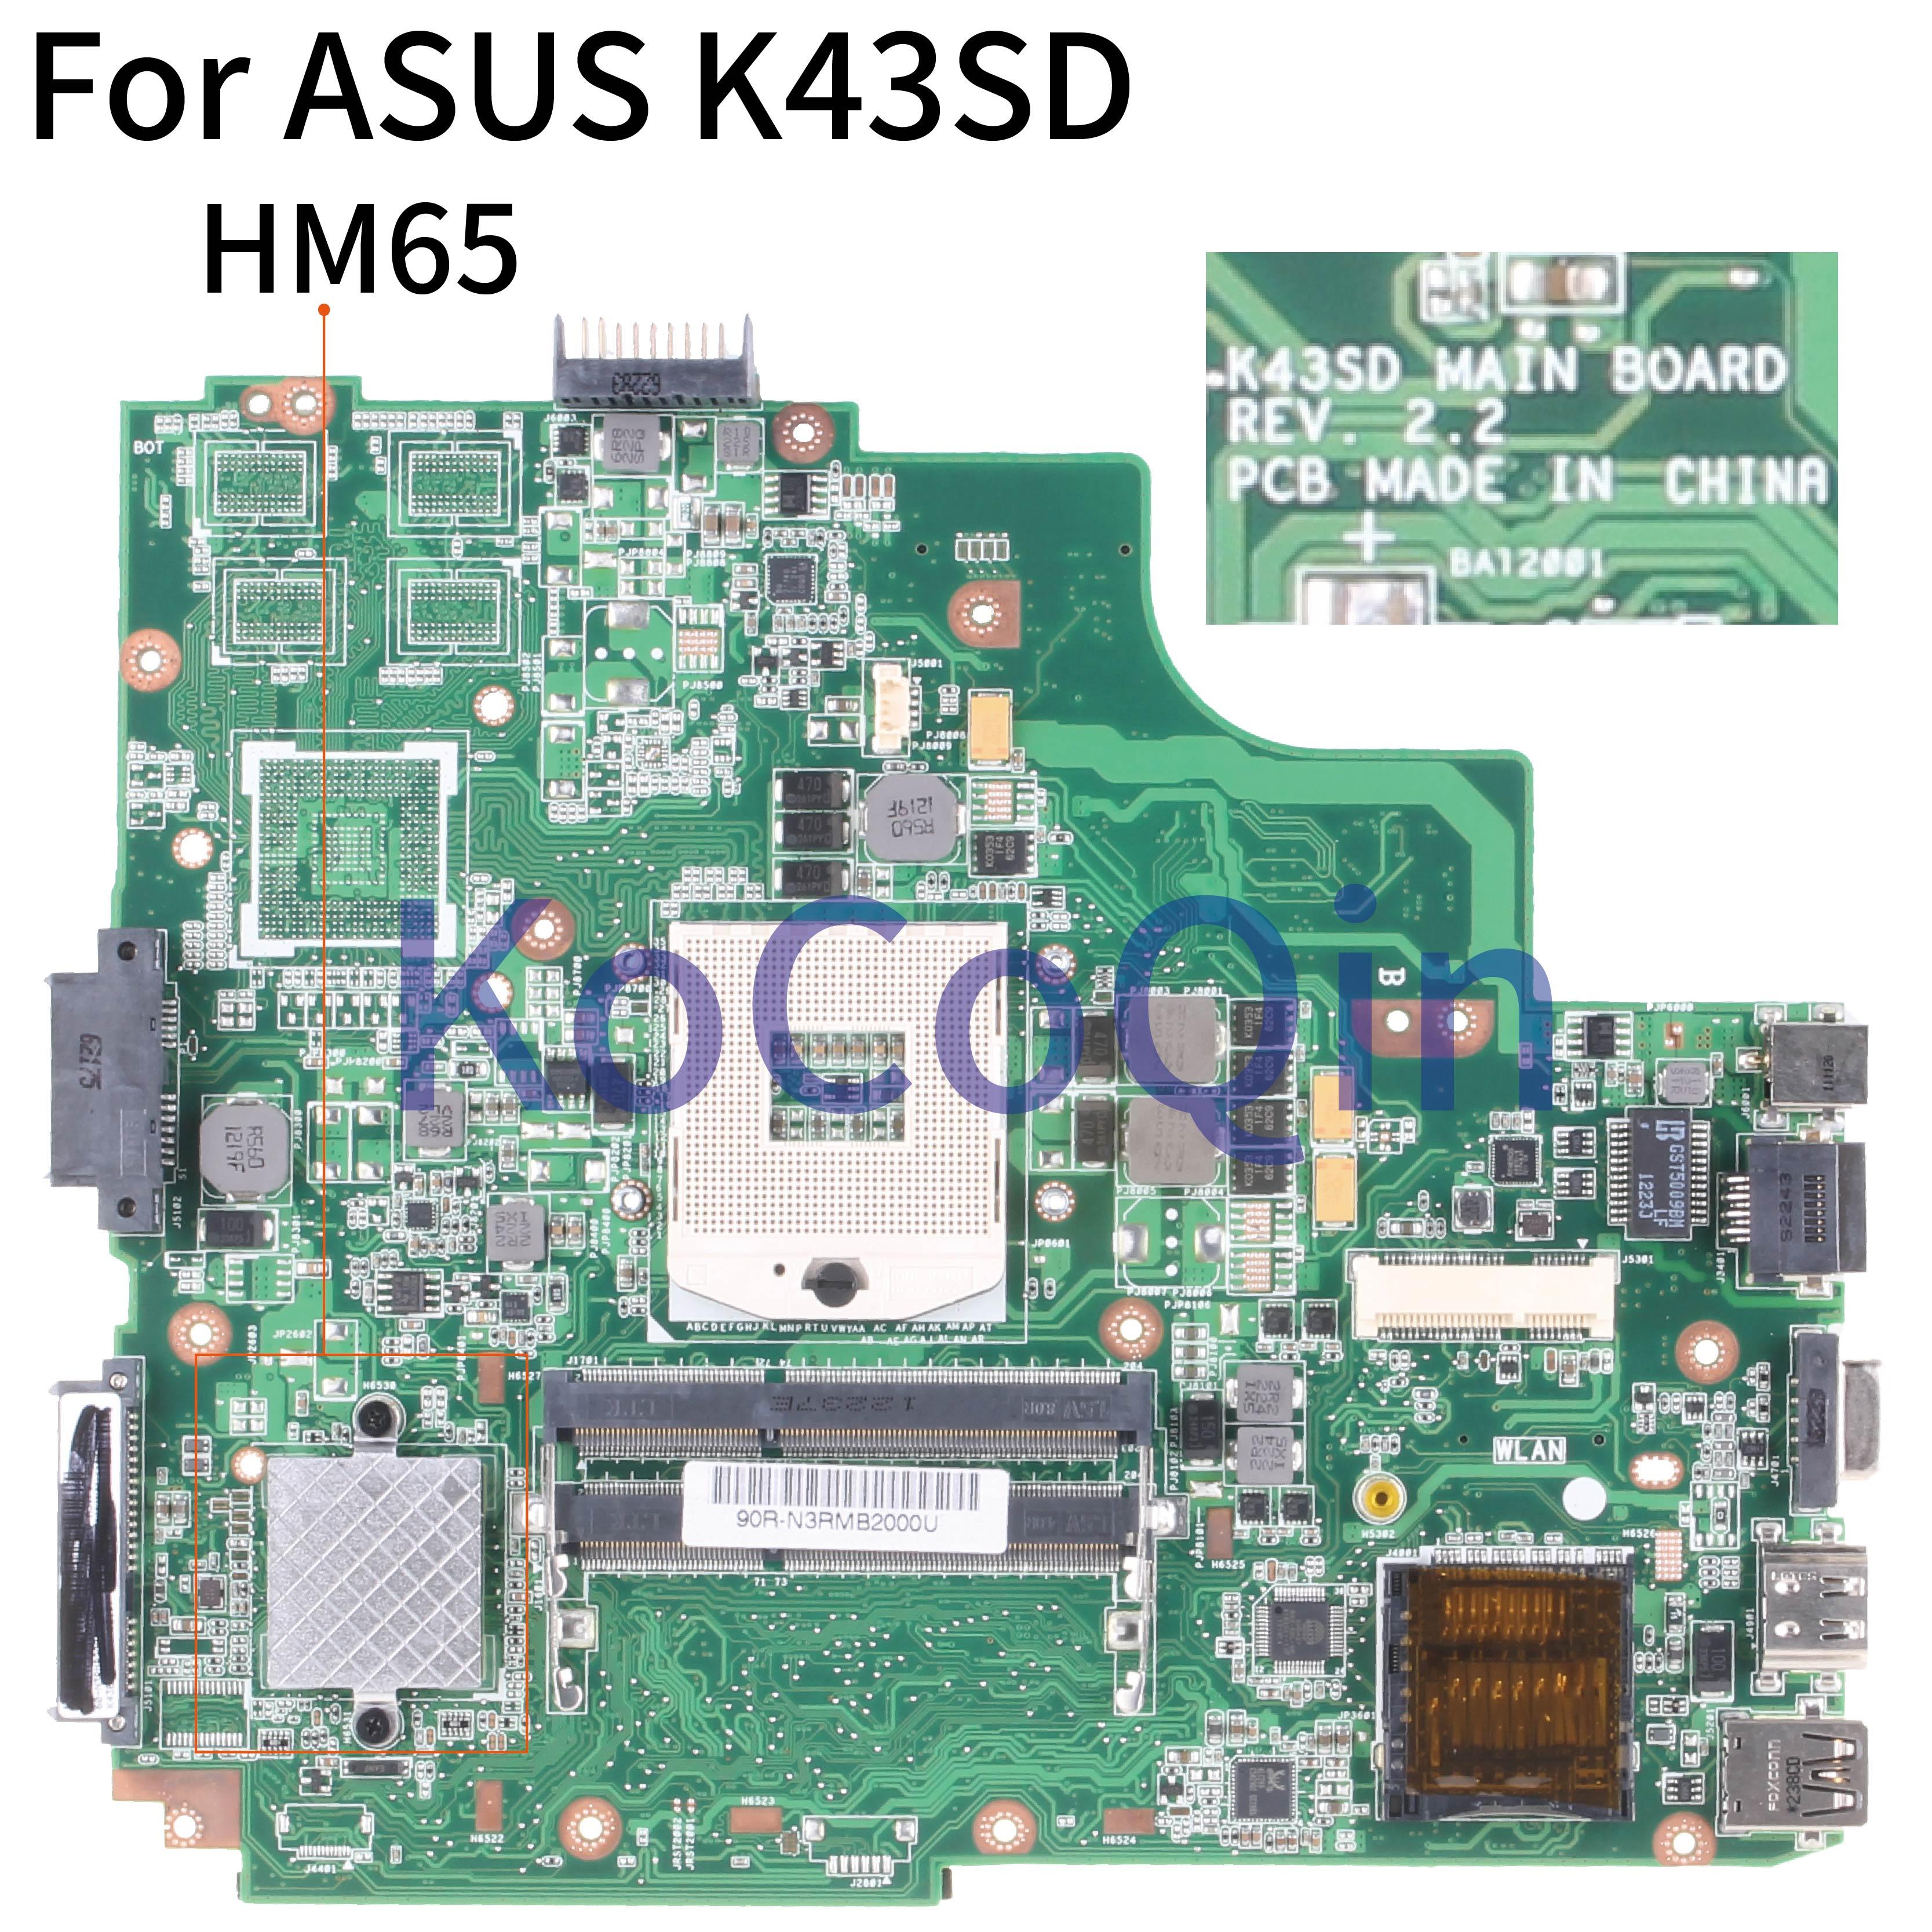 KoCoQin Laptop Motherboard For For ASUS K43SD K43E P43E A43E K43SV K43 Mainboard REV2.2 HM65